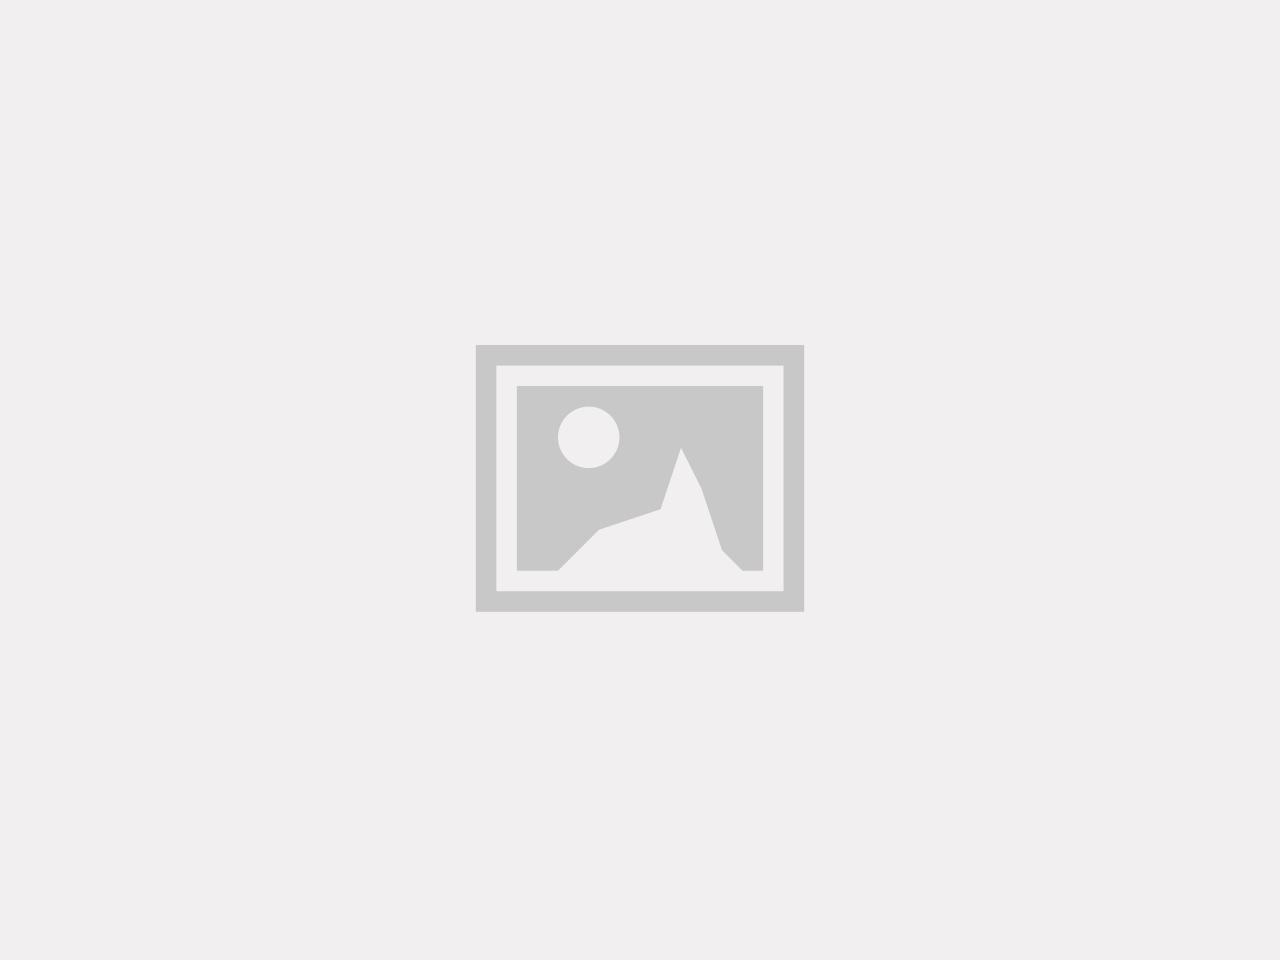 Vridväxel V13 VIT kugghjul (A02E)